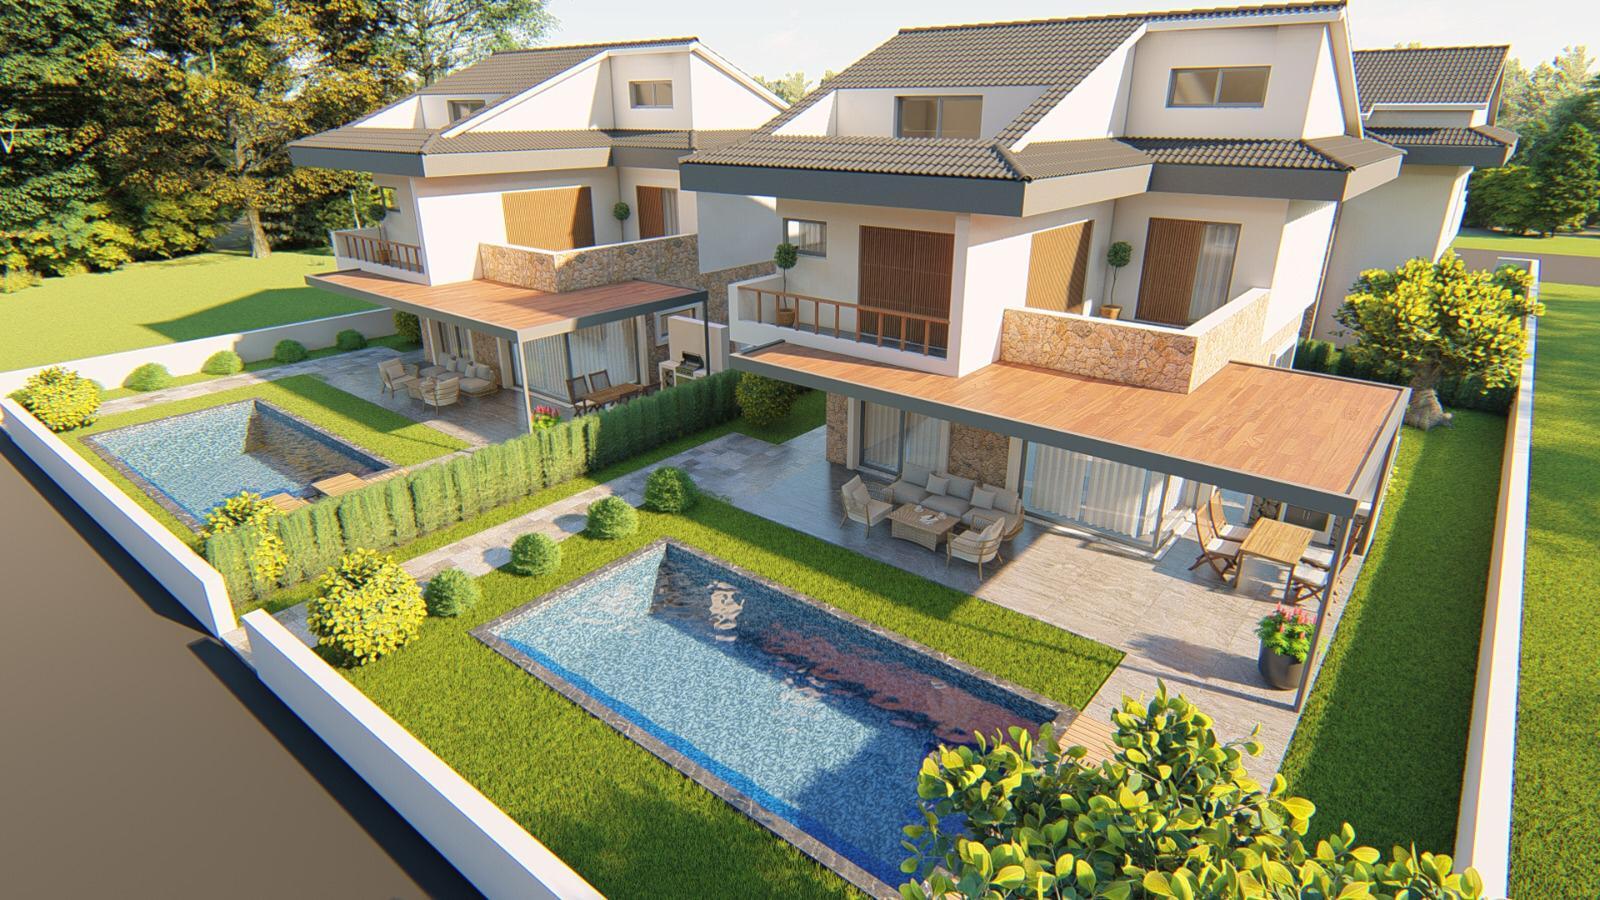 Exclusive 5 Bedroom Calis Villas with Private Pool & Gardens